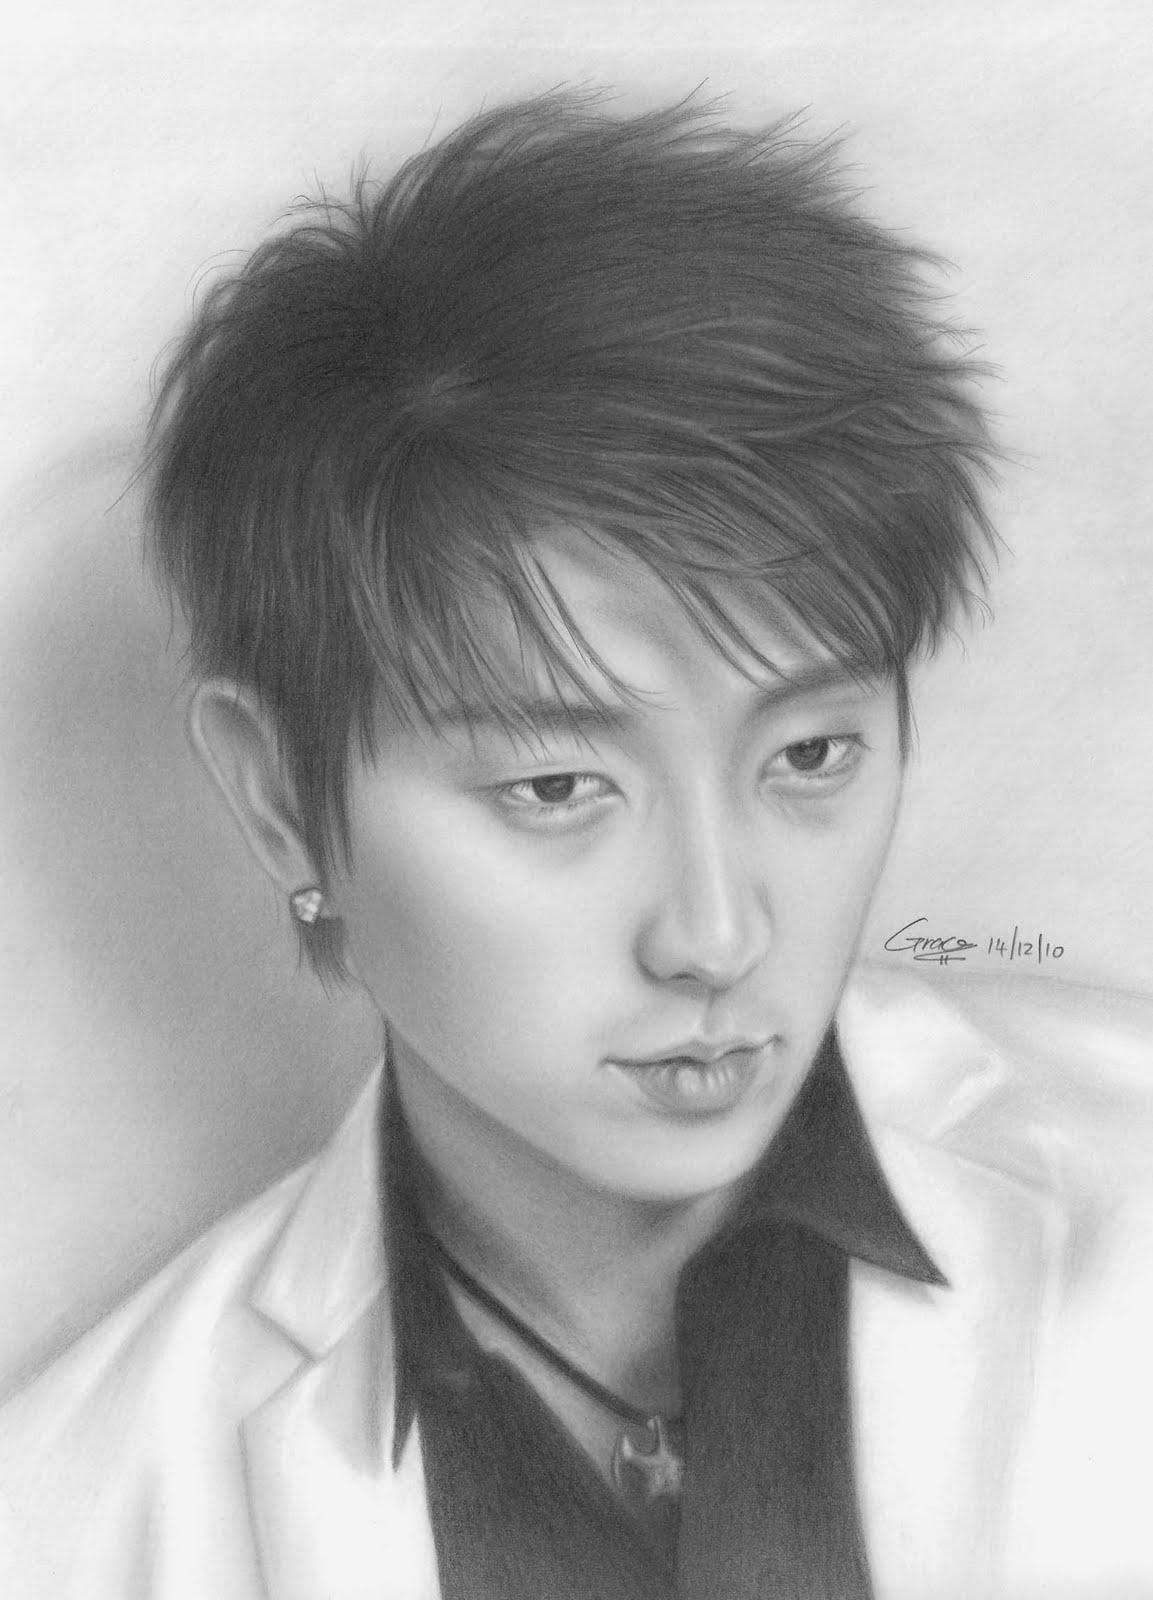 Lee-Jun-Ki Stunningly And Incredibly Realistic Pencil Portraits